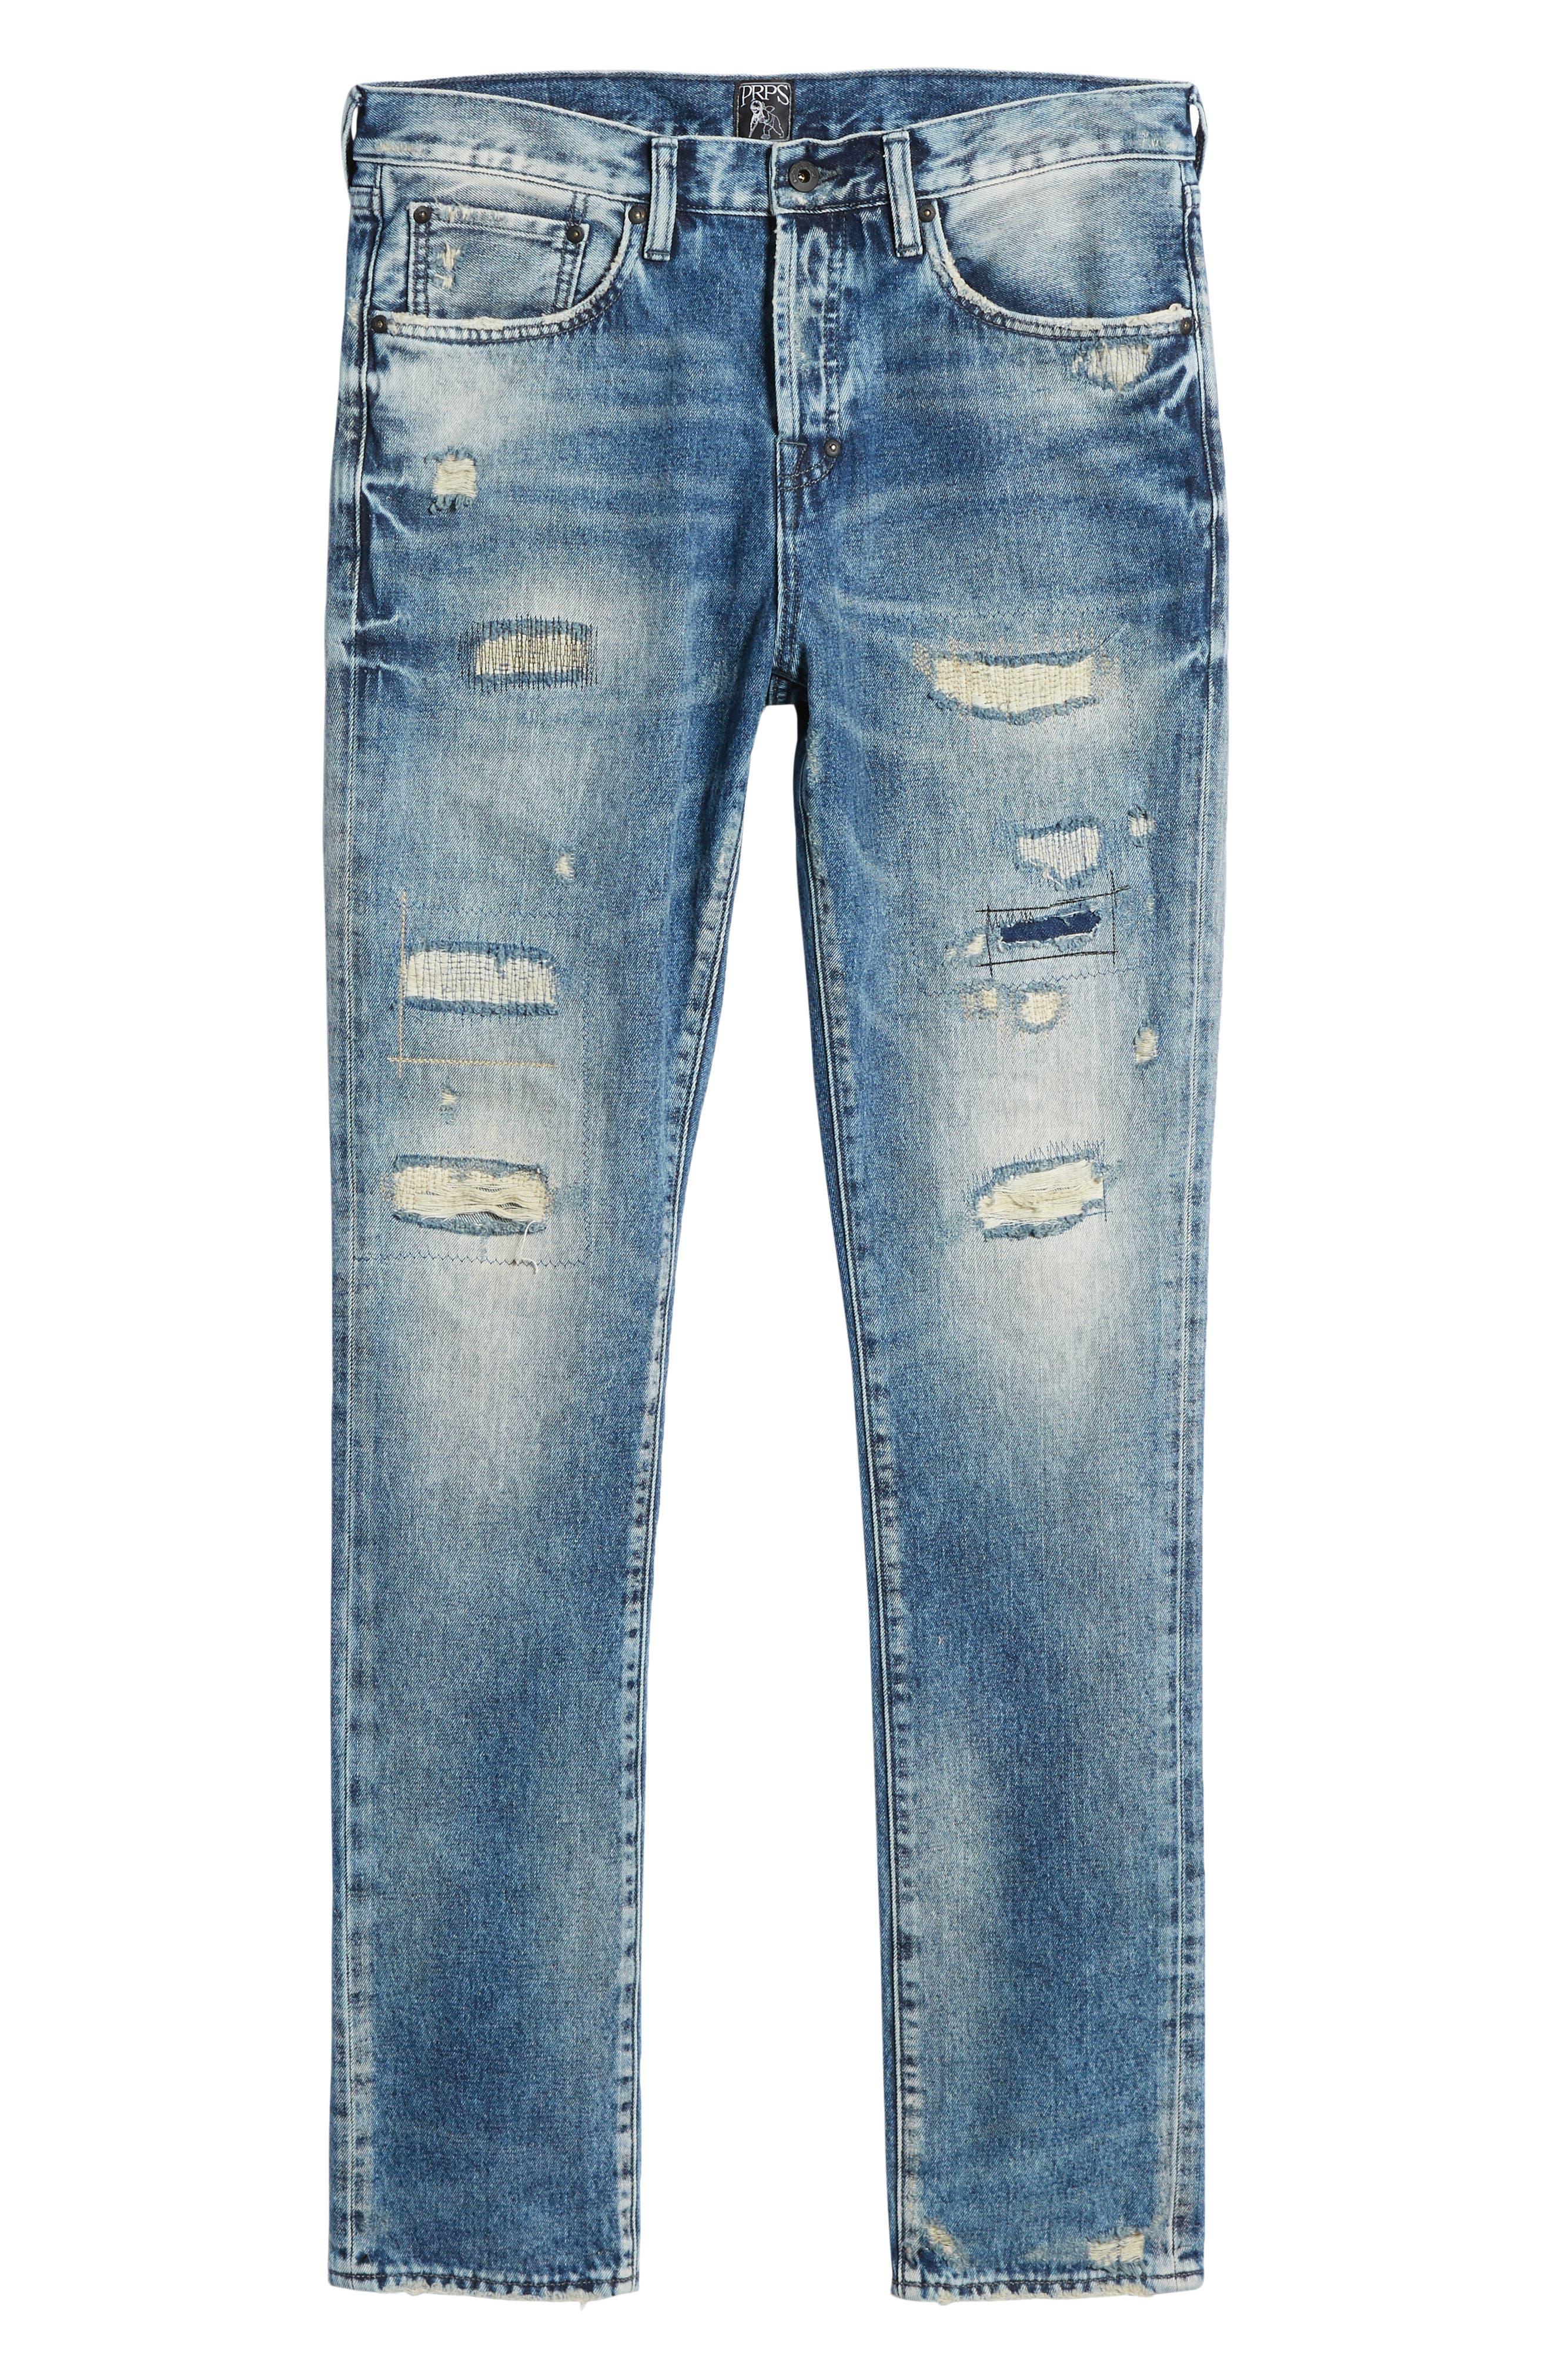 Demon Slim Straight Leg Jeans,                             Alternate thumbnail 6, color,                             MEXICO